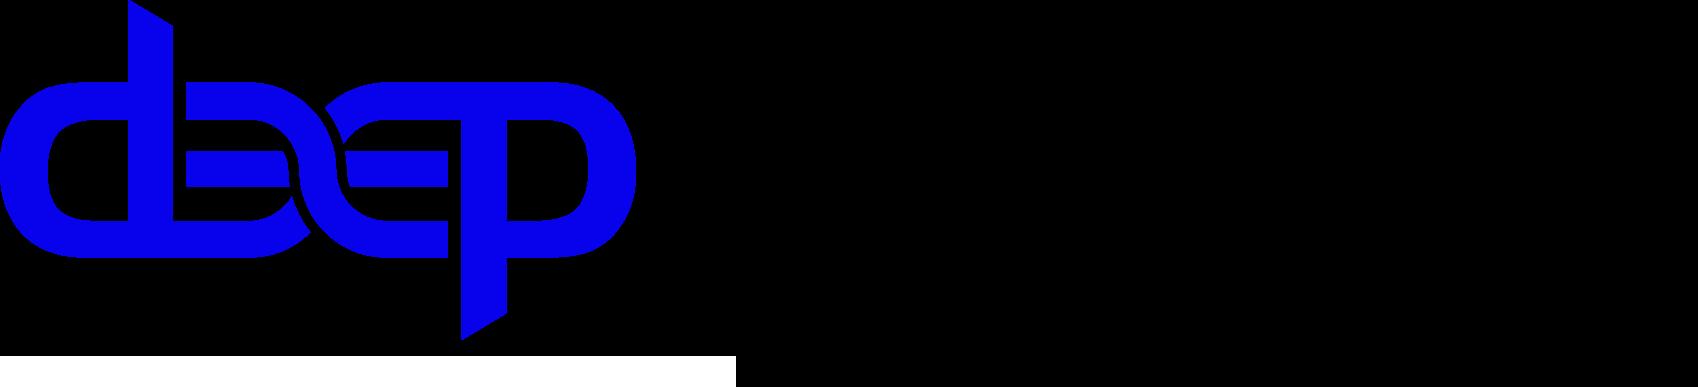 LOGO (1) black.png